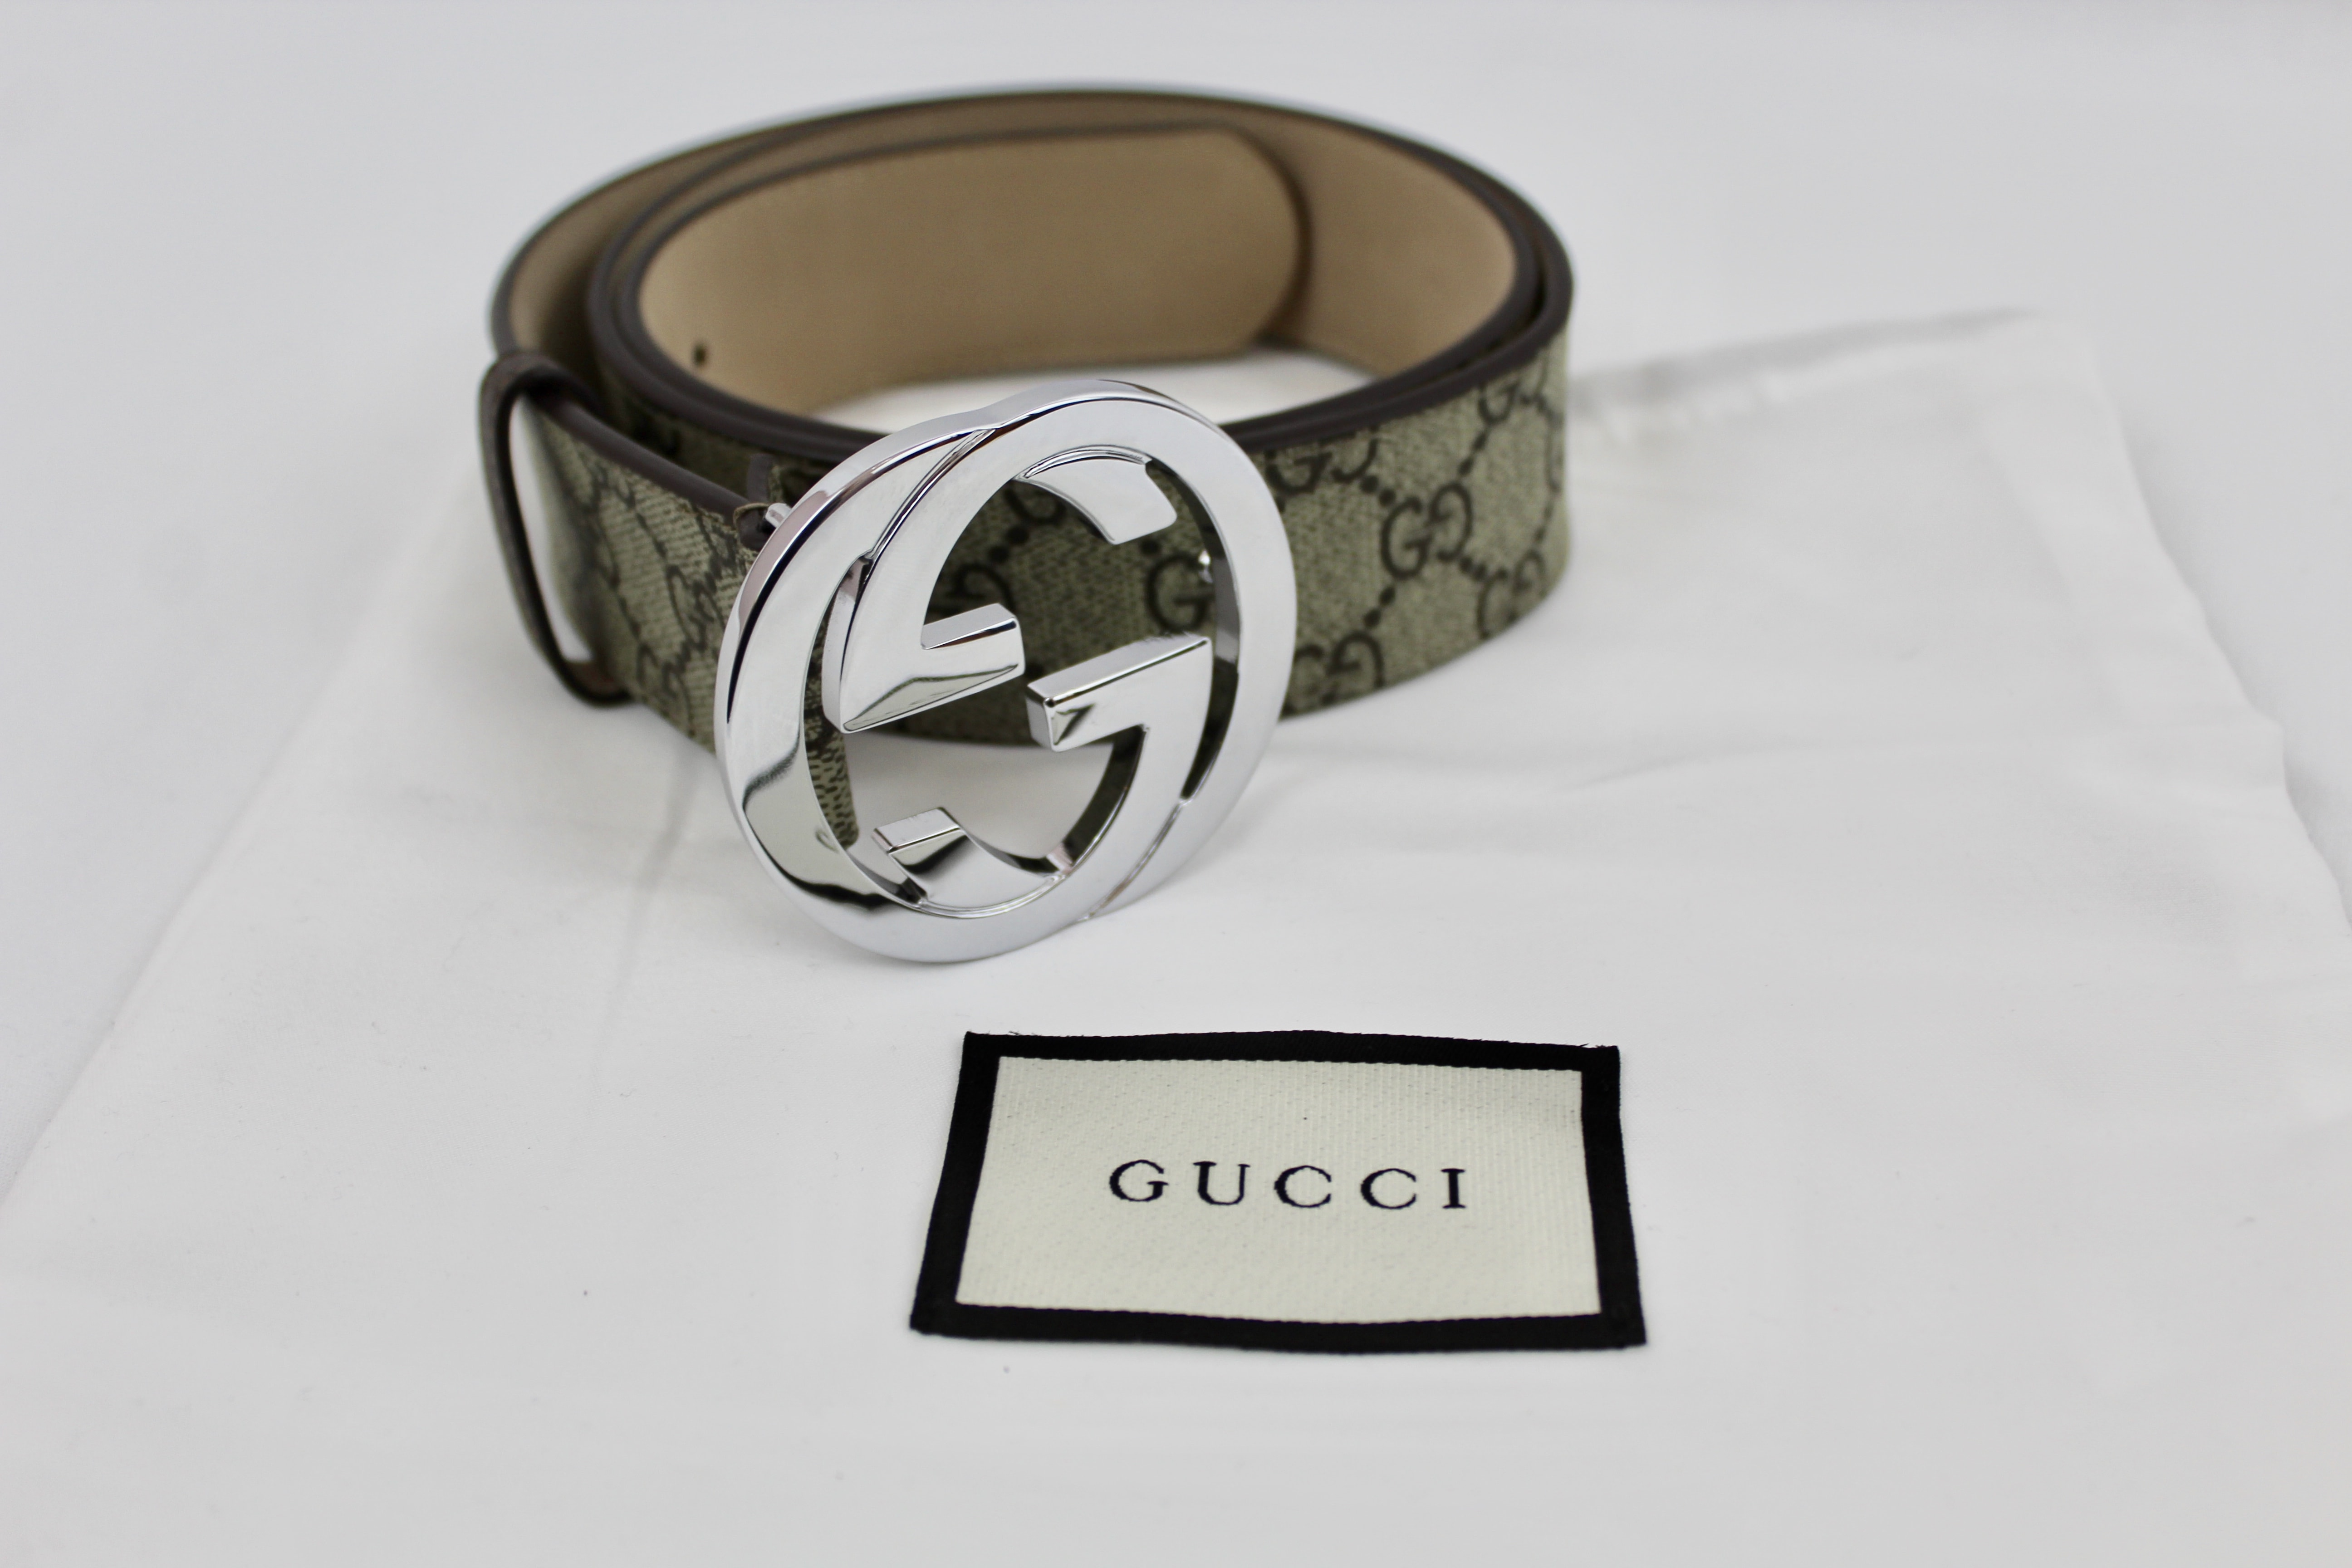 c7af4092428f GUCCI GG Supreme brown beige belt – Changes Luxury Consignment